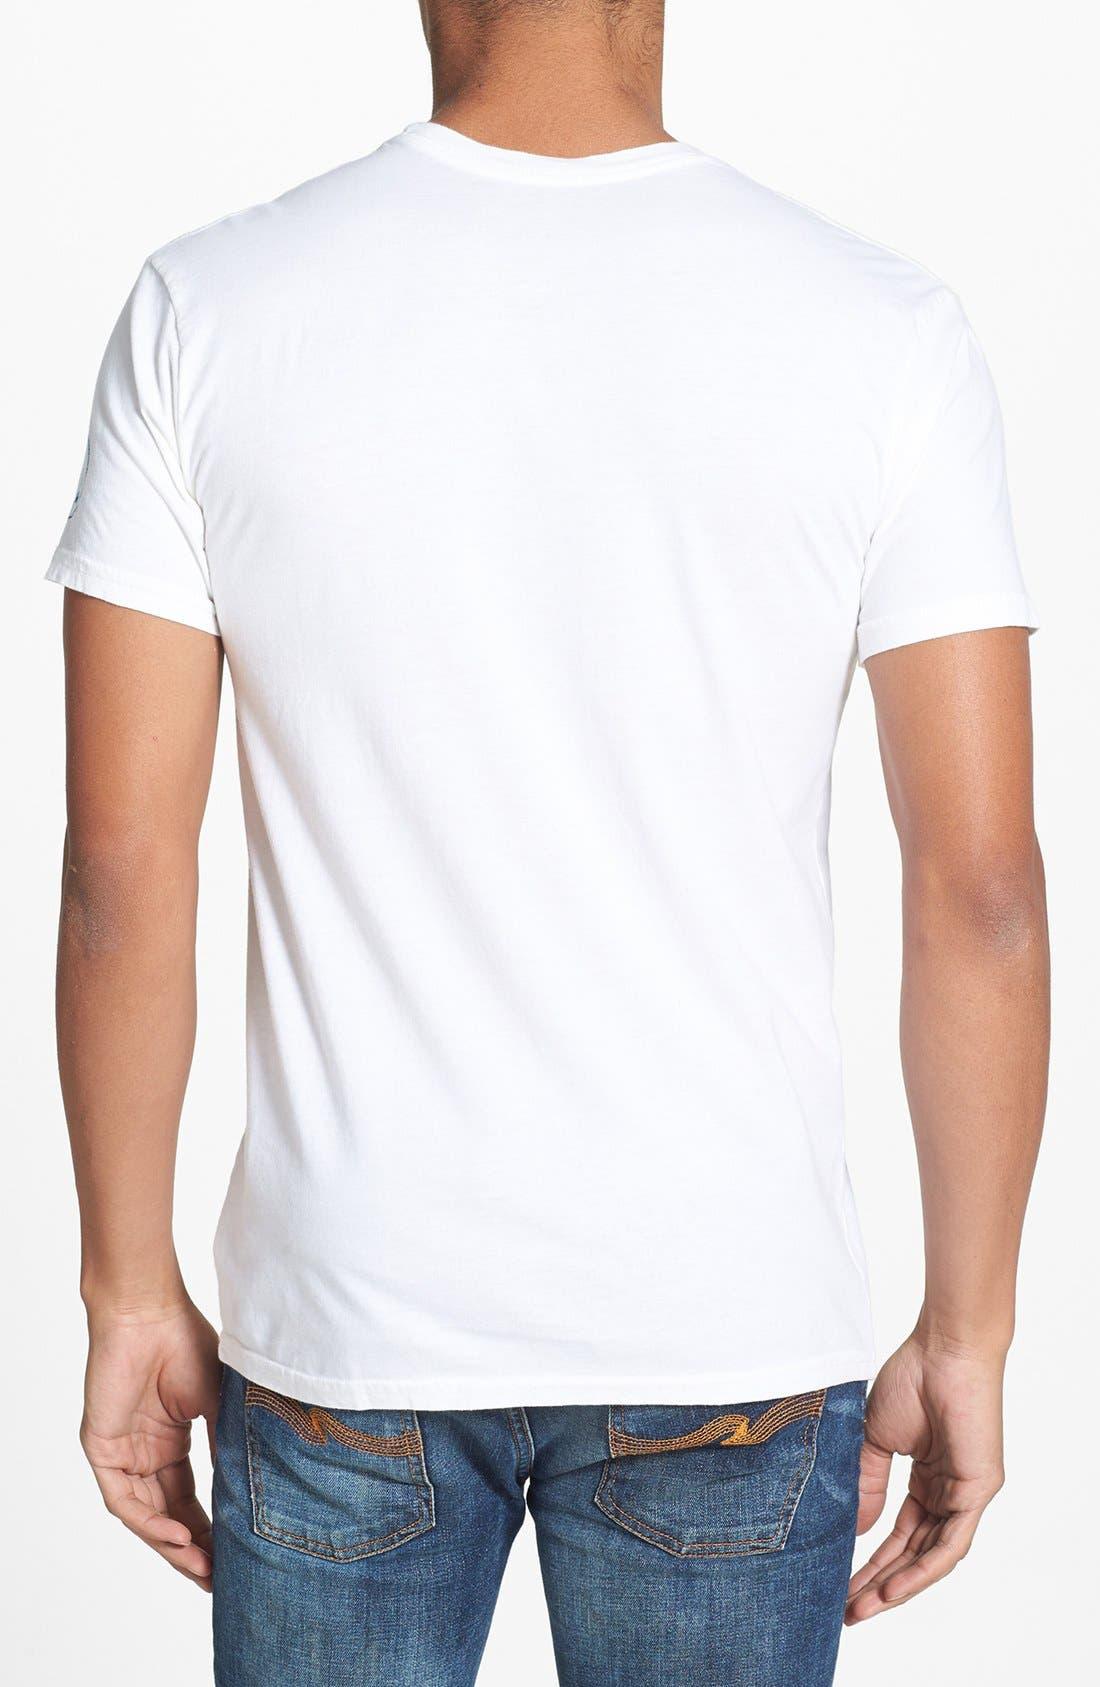 Alternate Image 2  - Retro Brand 'Penn State Nittany Lions' Team T-Shirt